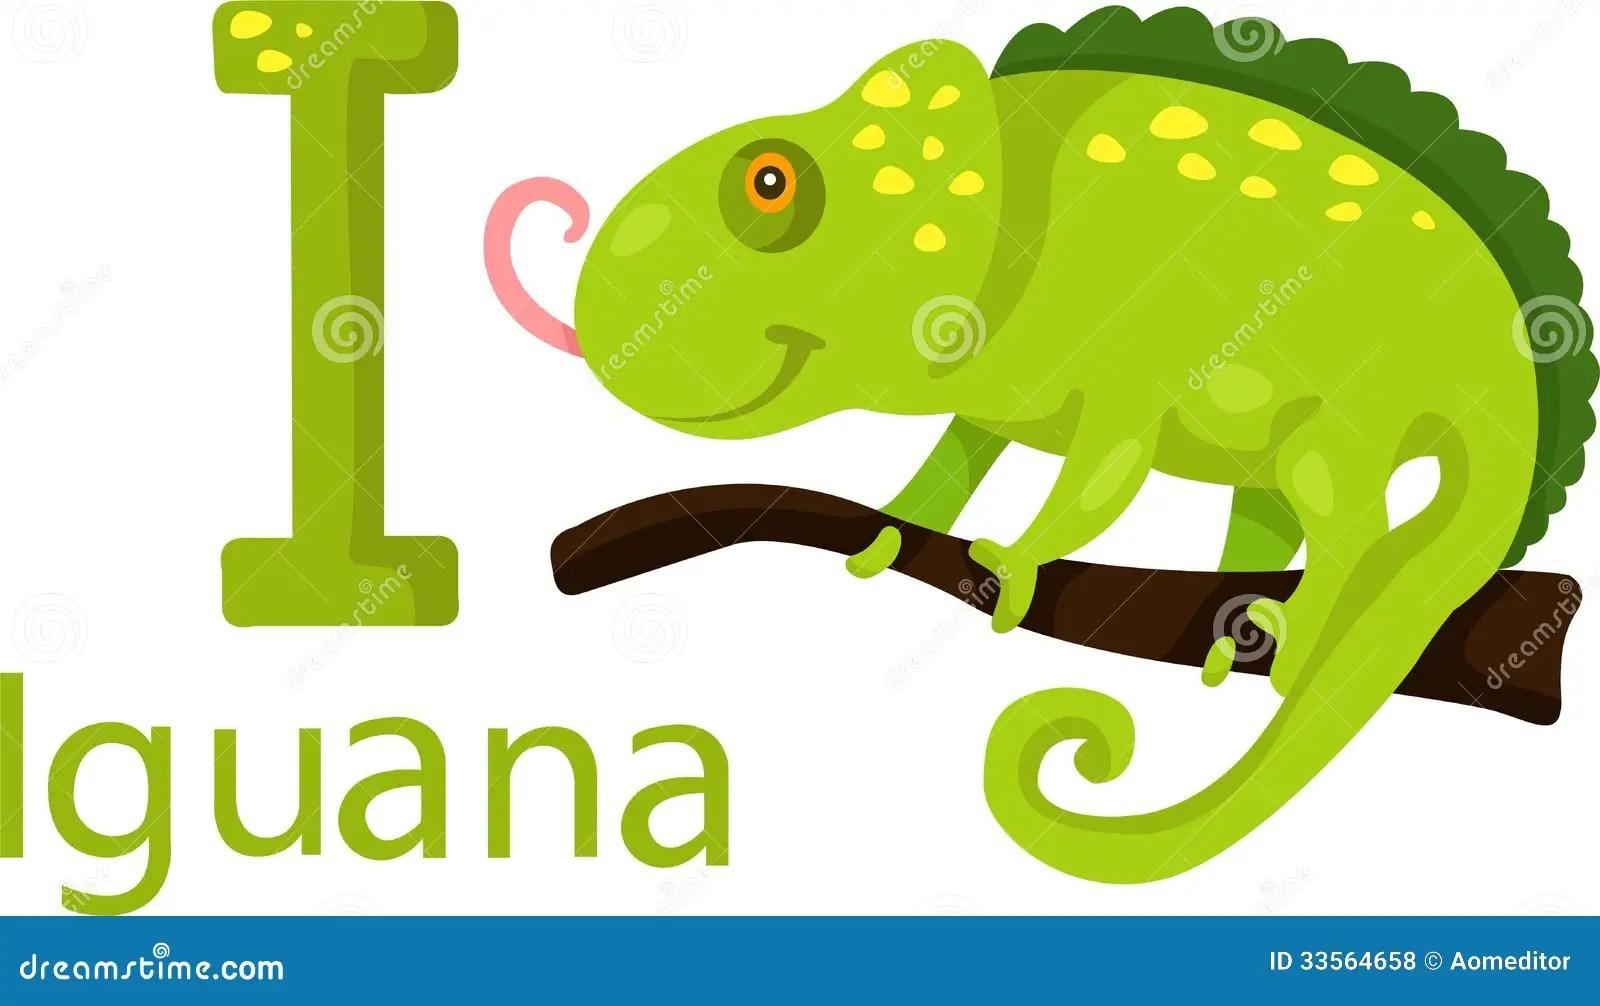 Illustrator Of I With Iguana Stock Vector